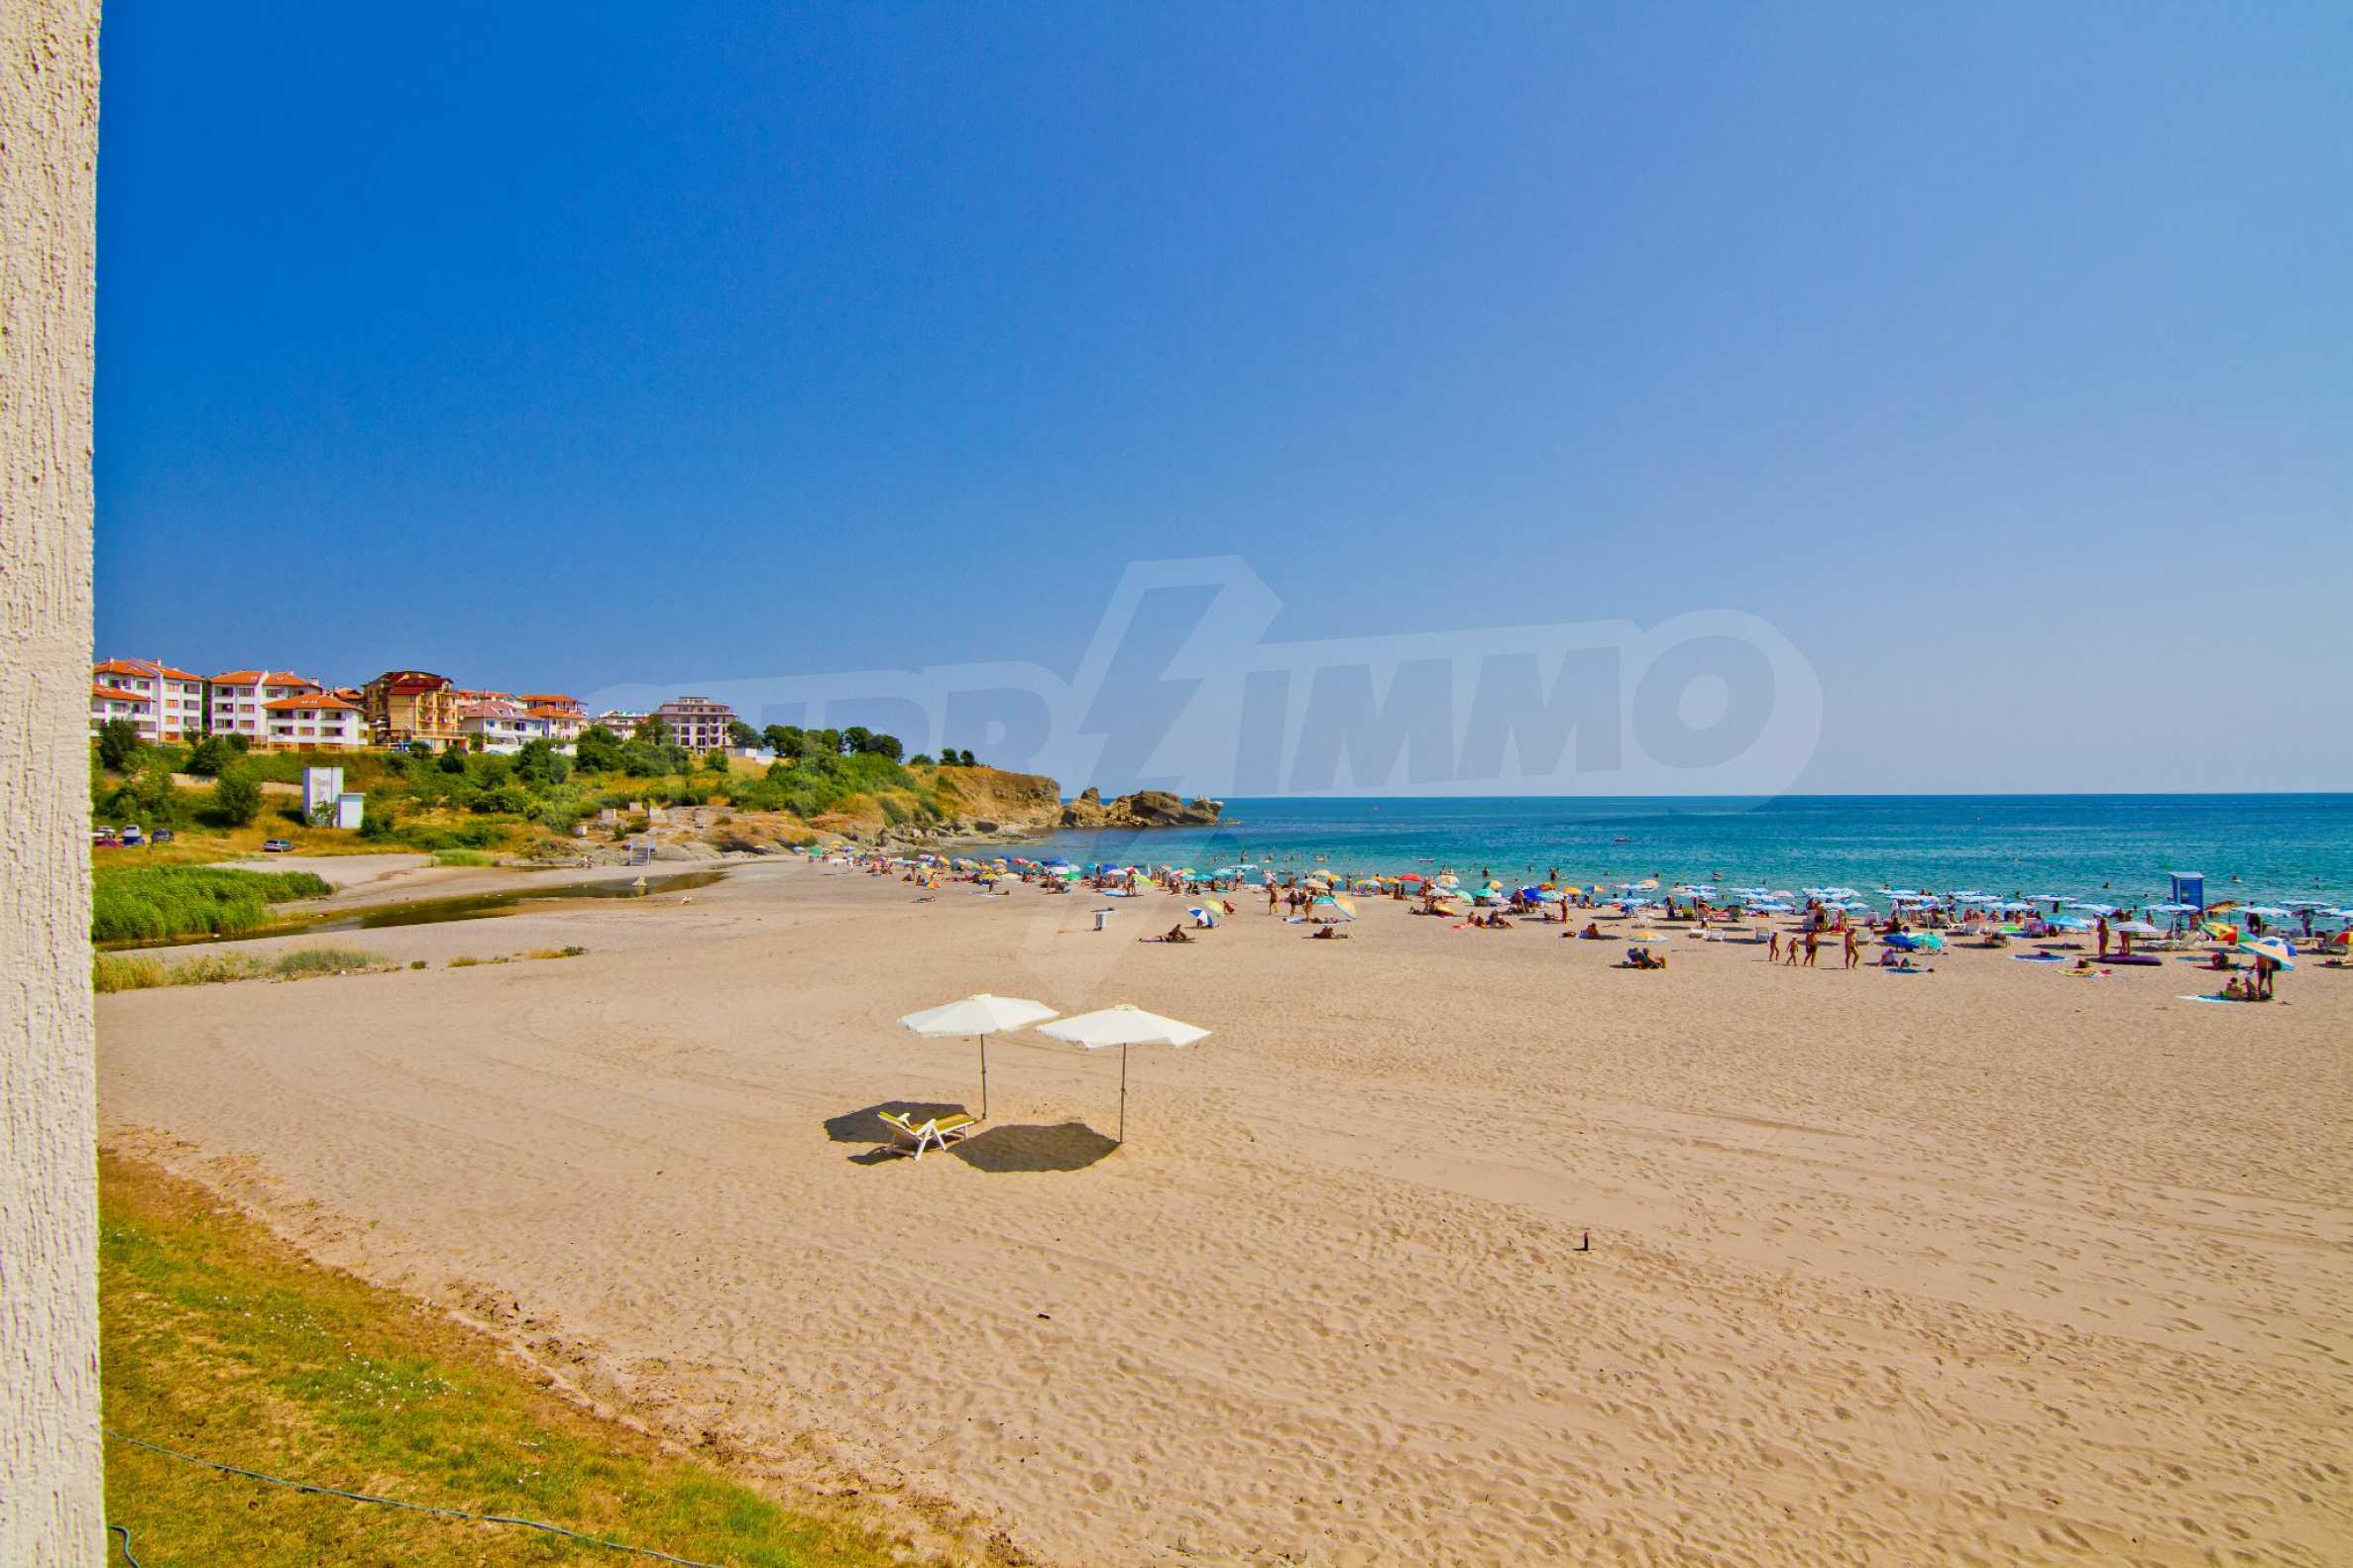 Примеа Бийч Резиденс / Primea Beach Residence 58